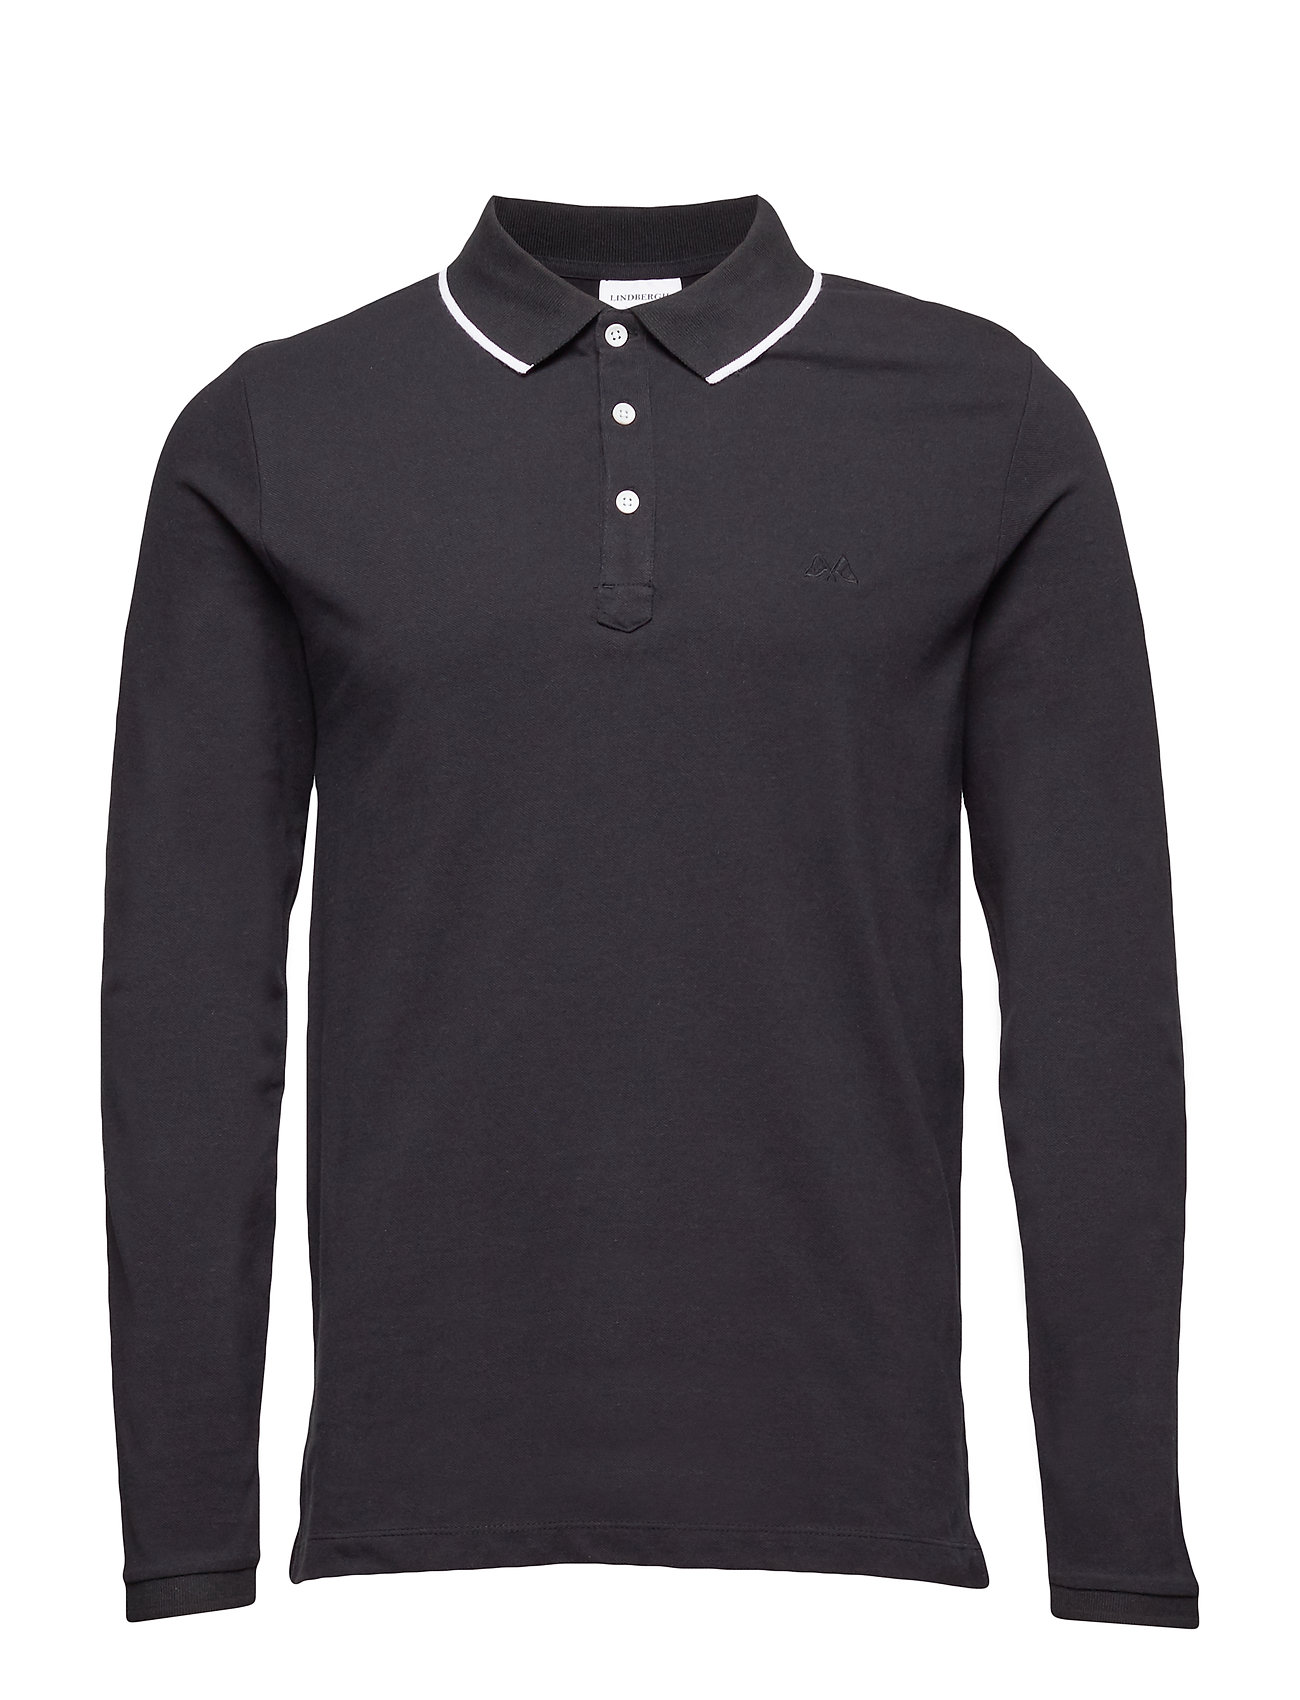 Image of Polo Shirt L/S Poloshirt Langærmet Sort LINDBERGH (3111743547)